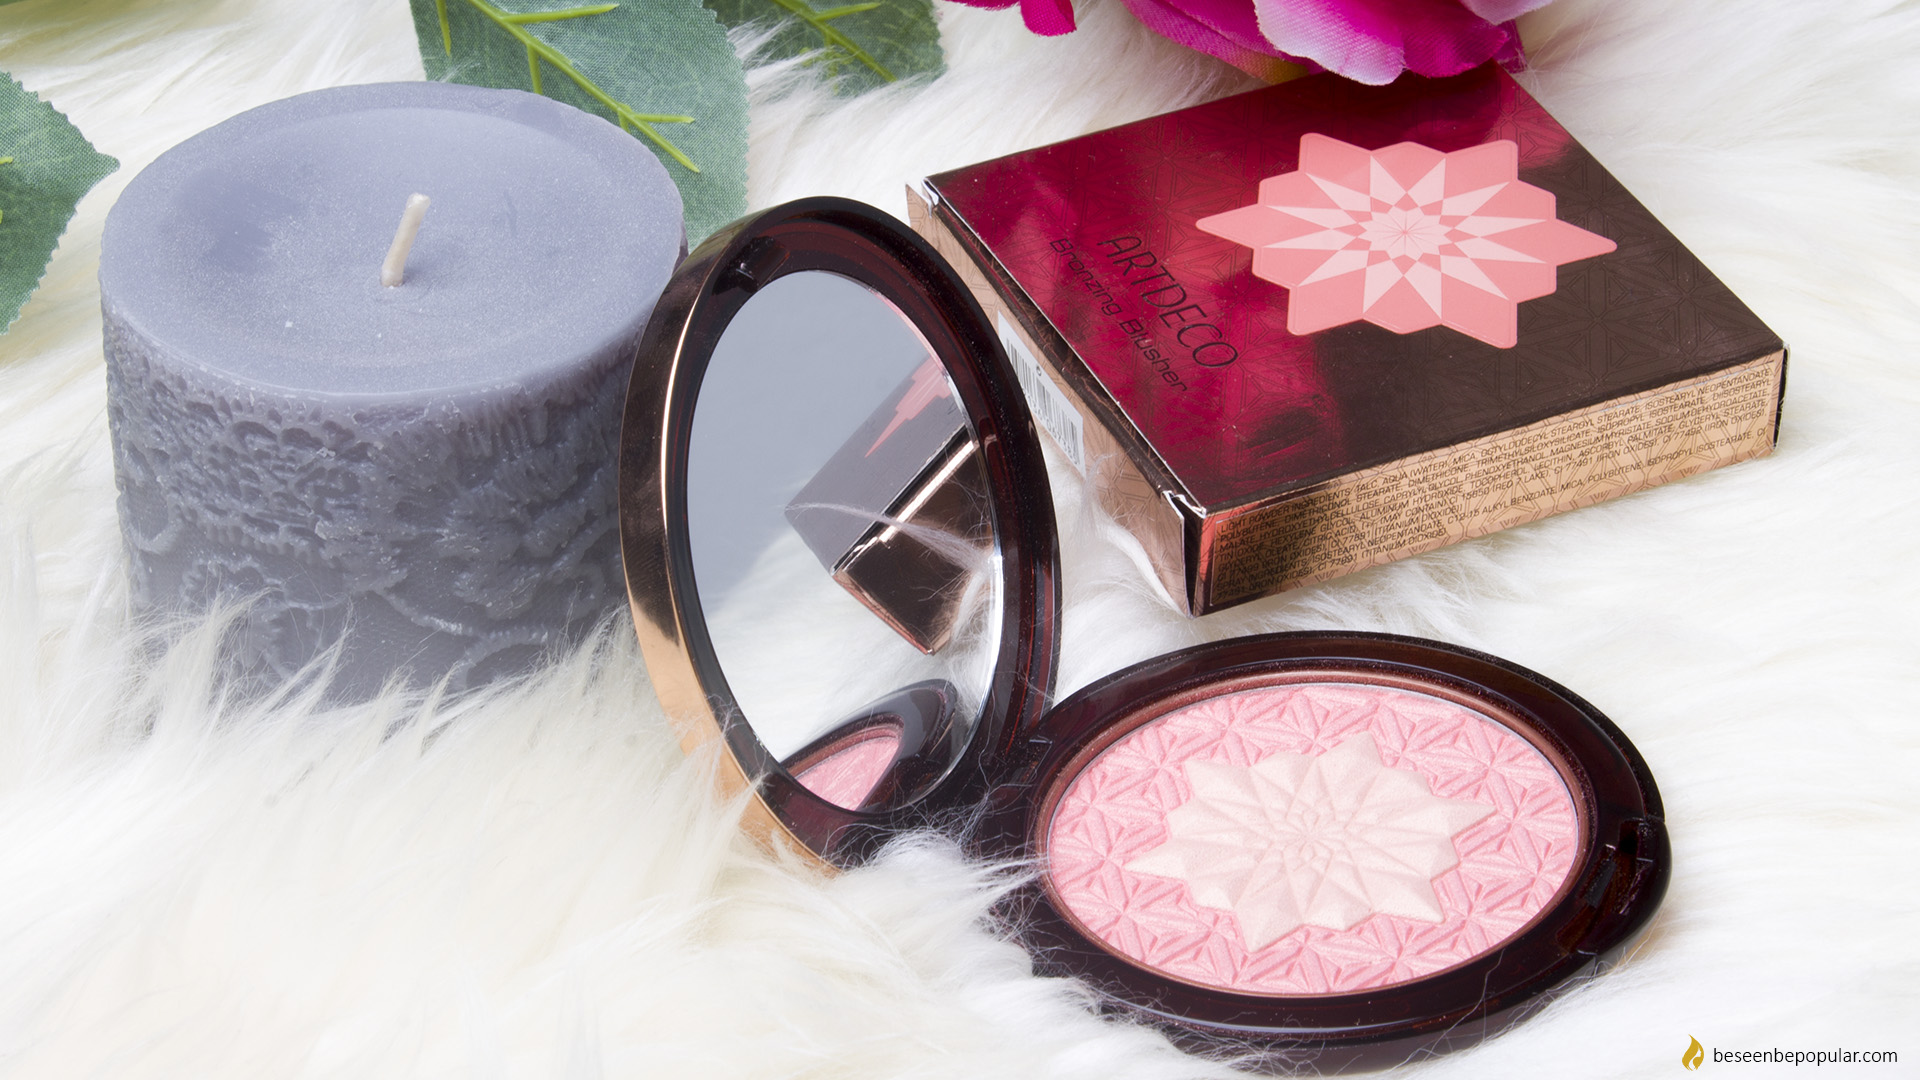 Artdeco bronzing blusher in two shades